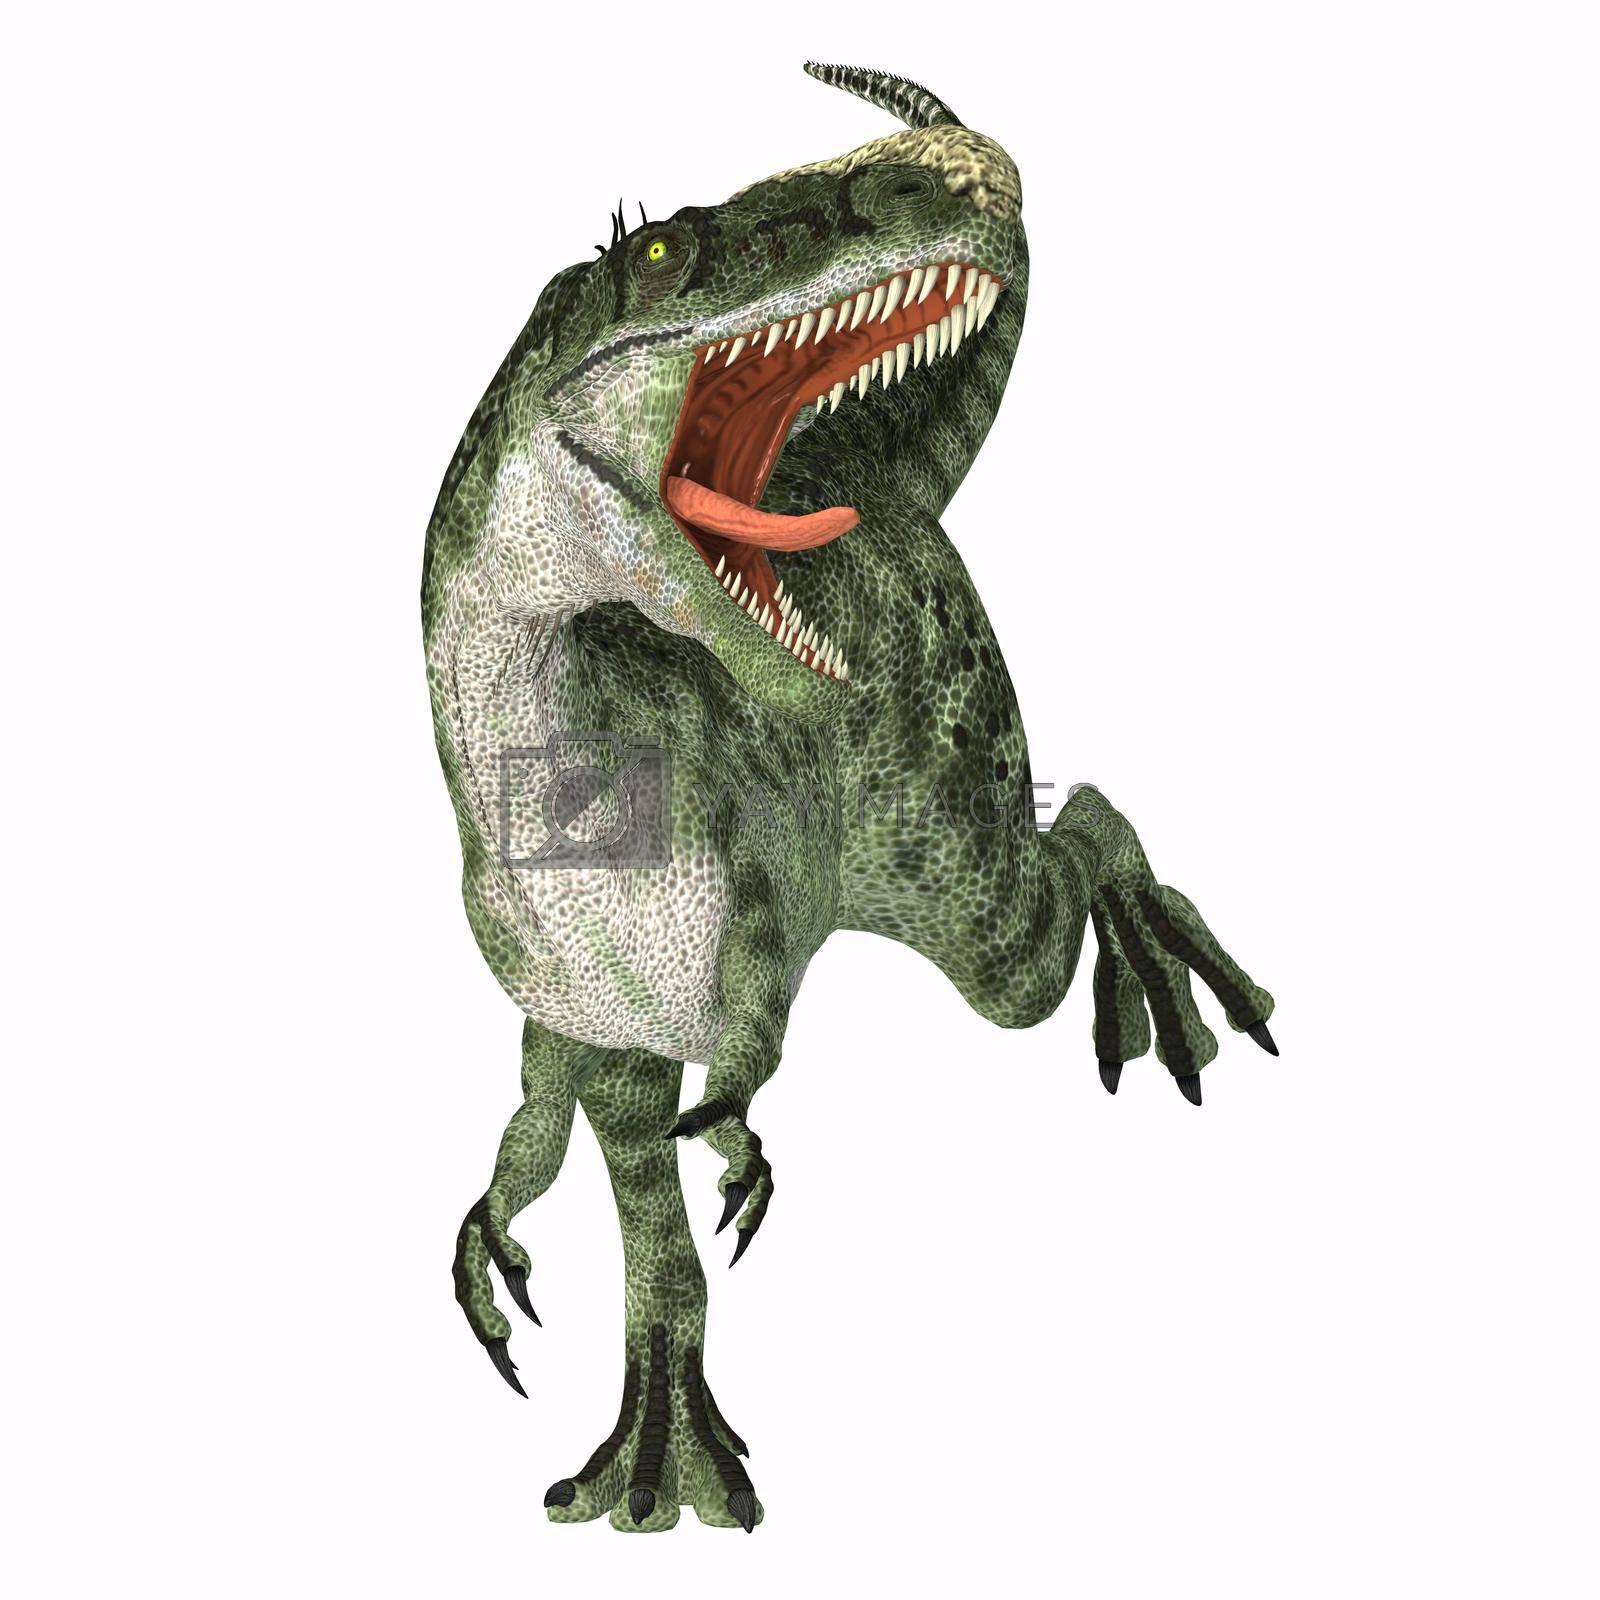 Royalty free image of Monolophosaurus Dinosaur Roaring by Catmando